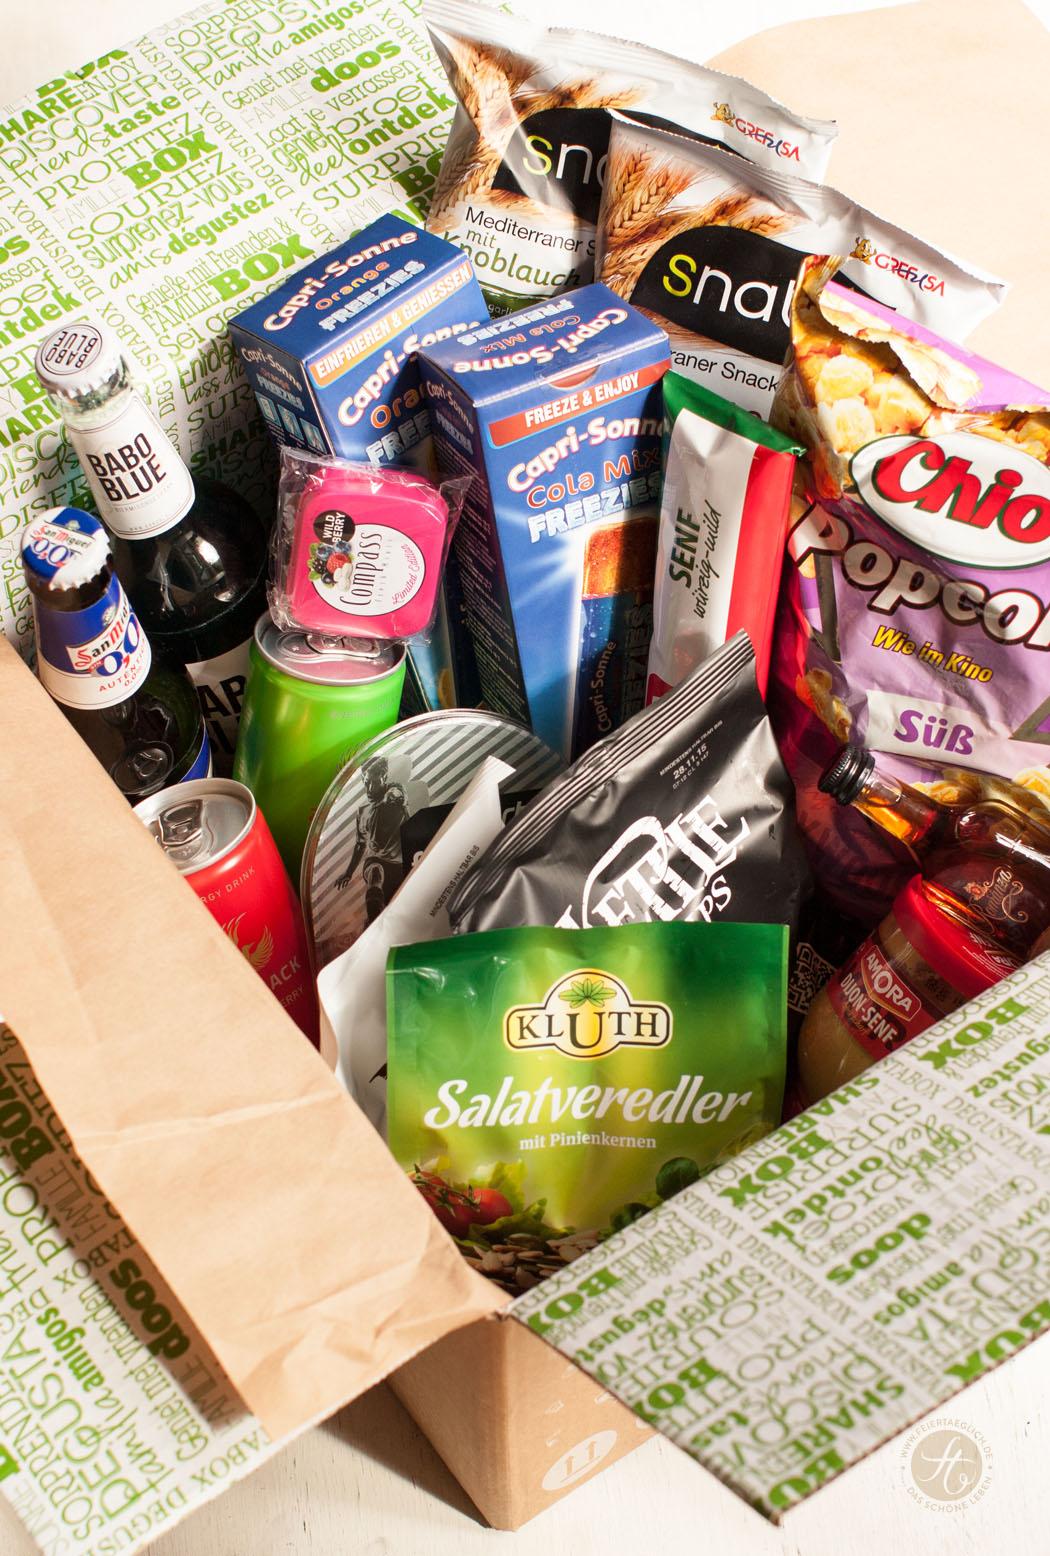 Degusta Box August 2015